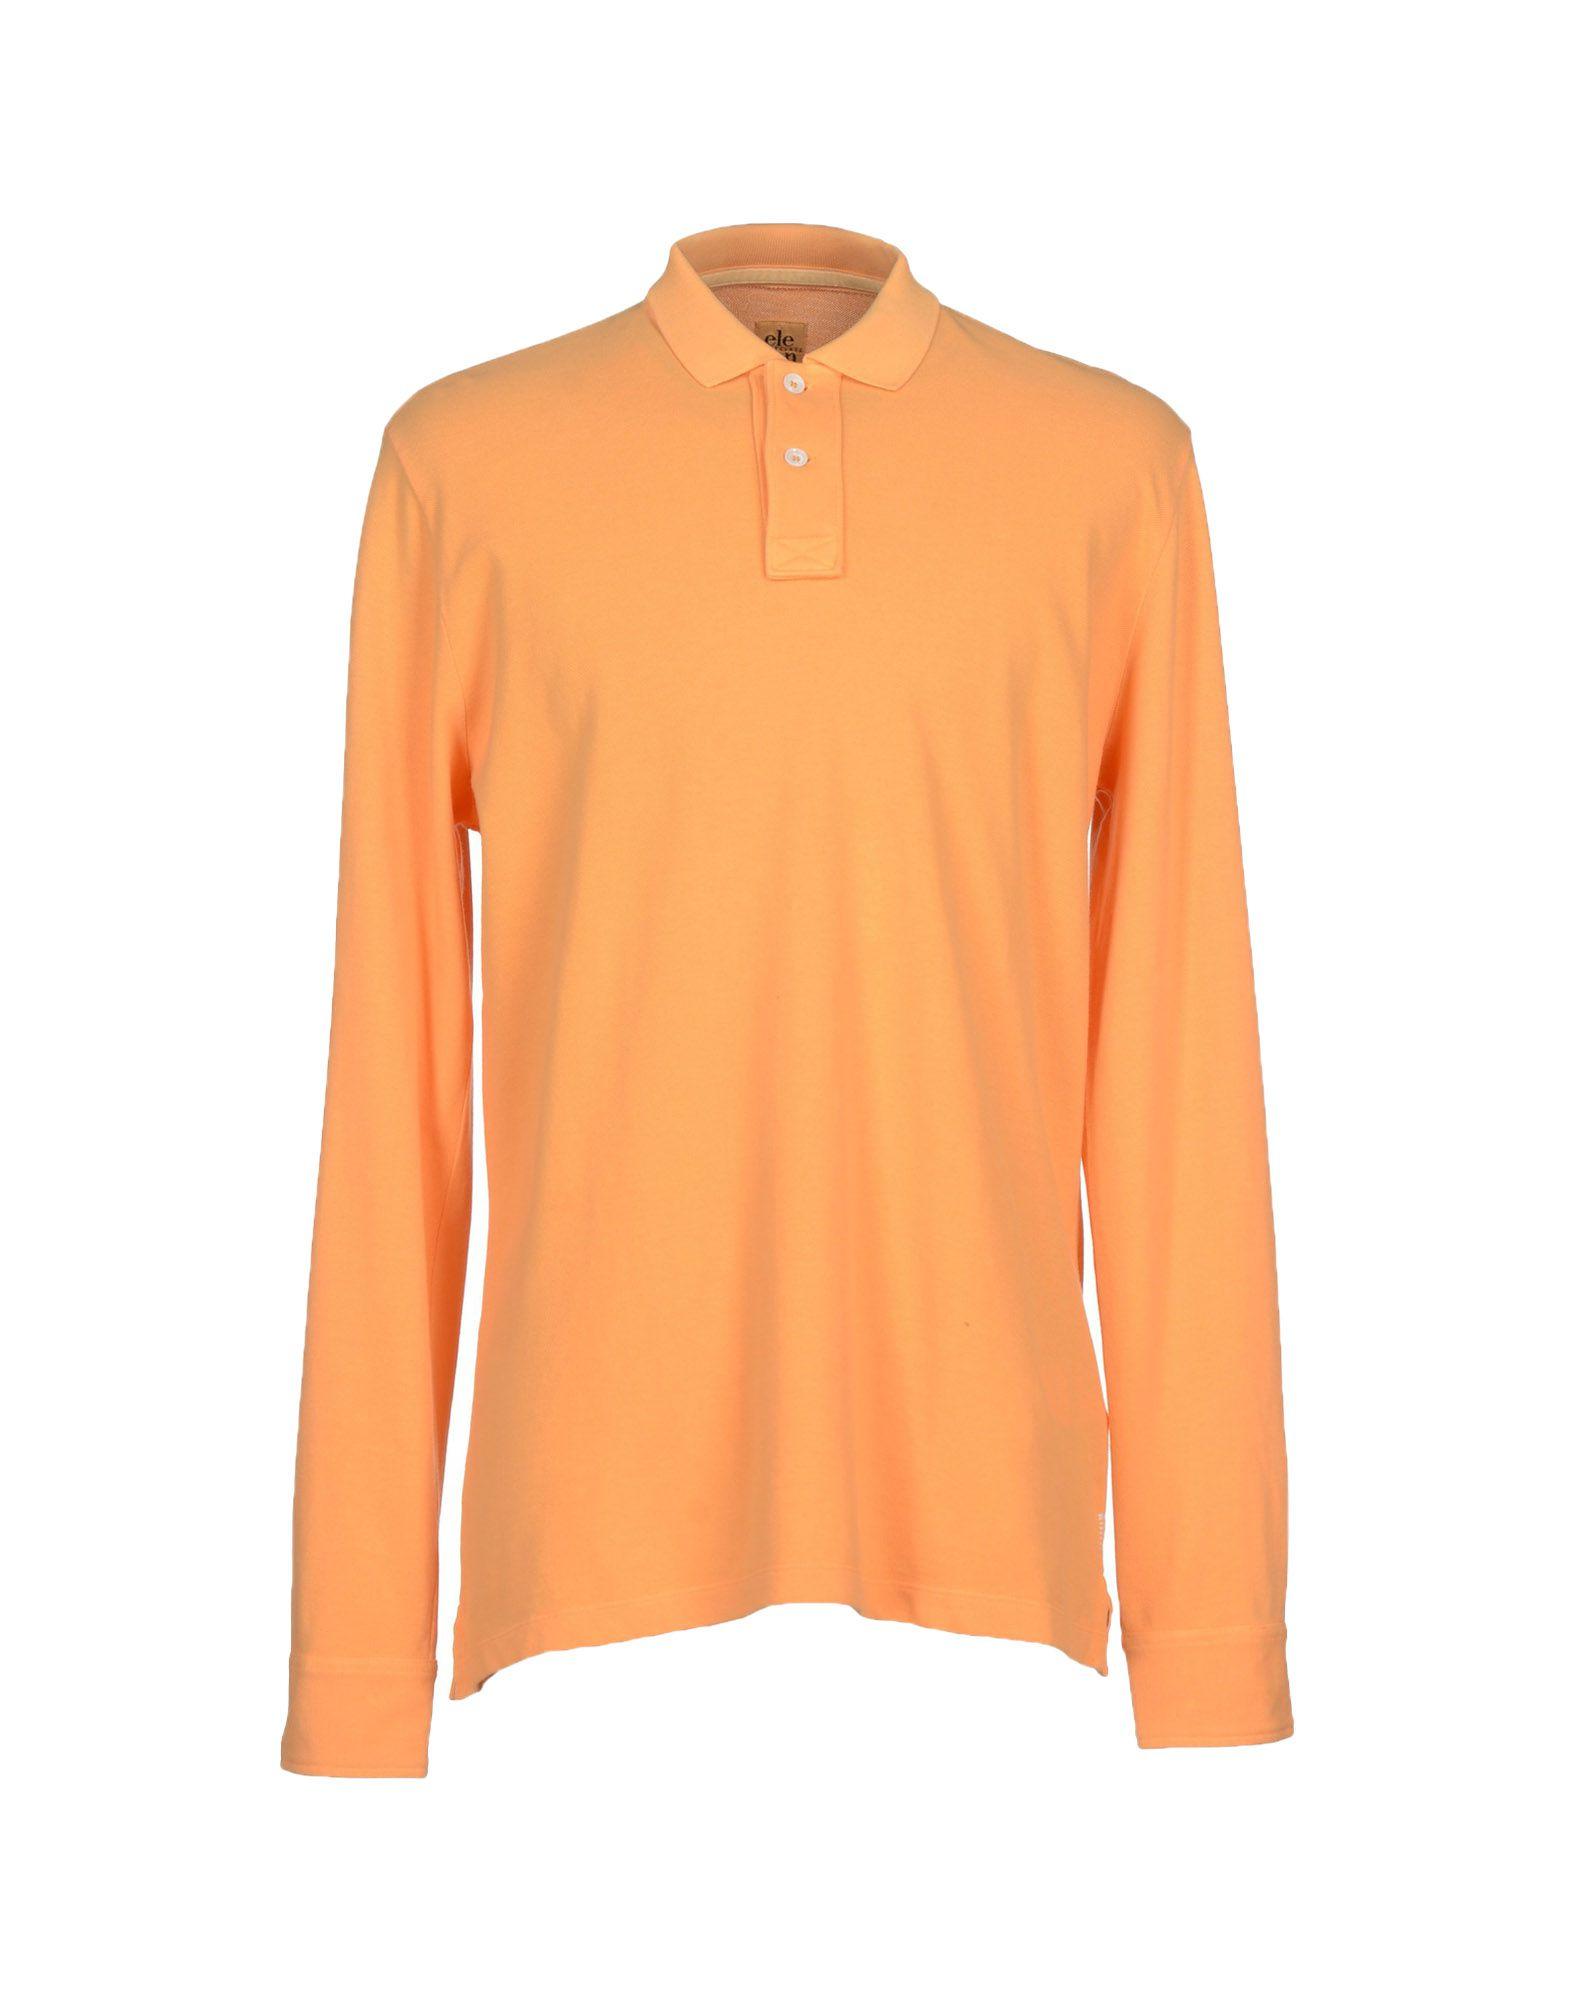 Eleventy polo shirt in orange for men apricot save 62 for Orange polo shirt mens